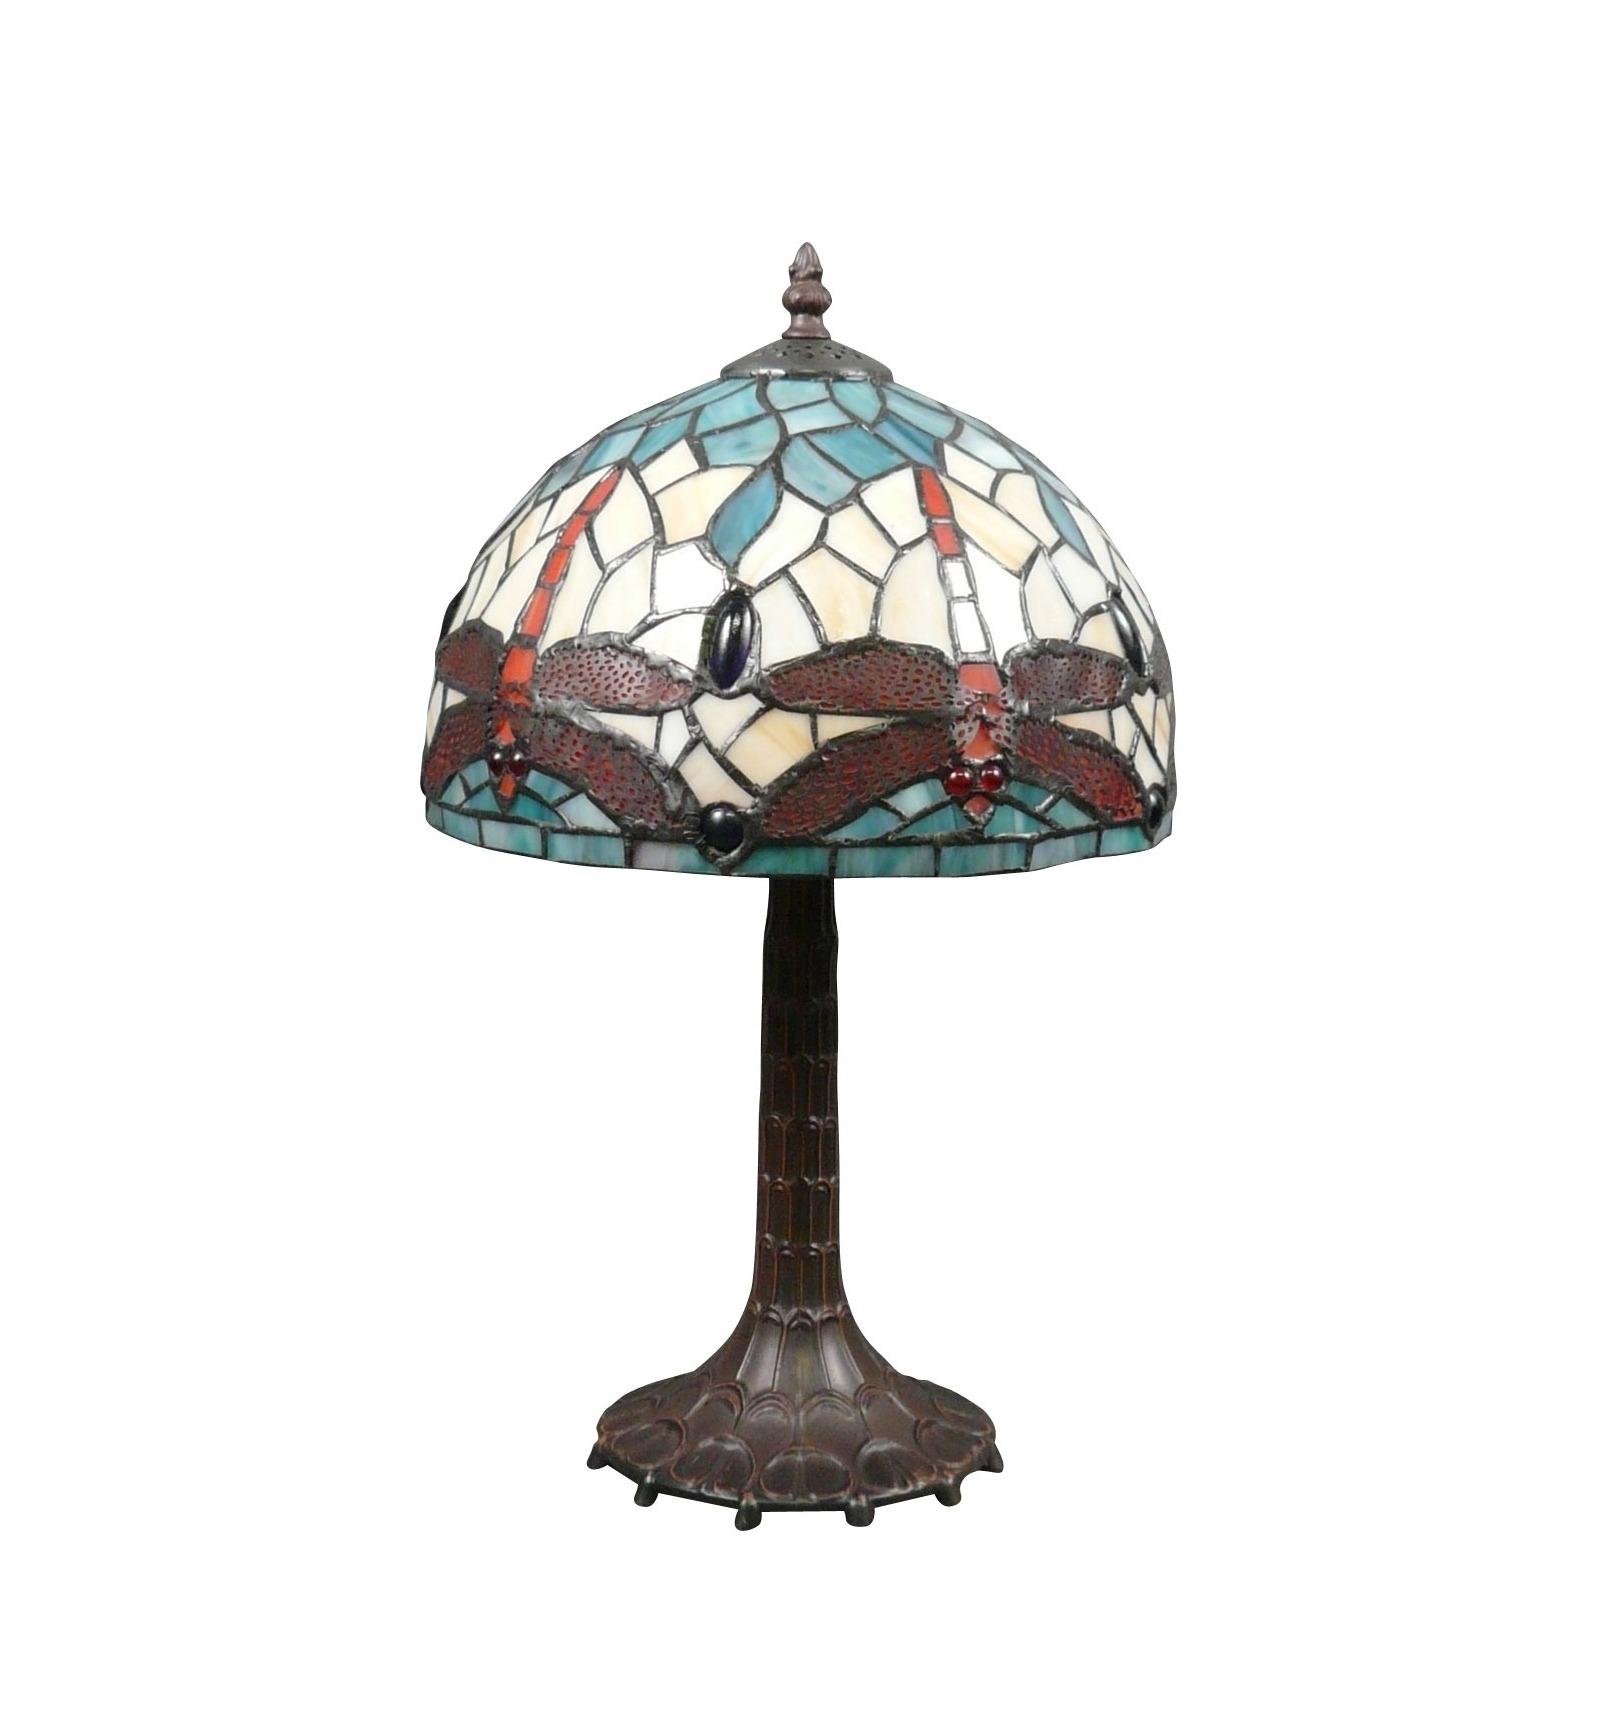 Lamp Tiffany Dragonfly Style Art Nouveau Art Deco Furniture